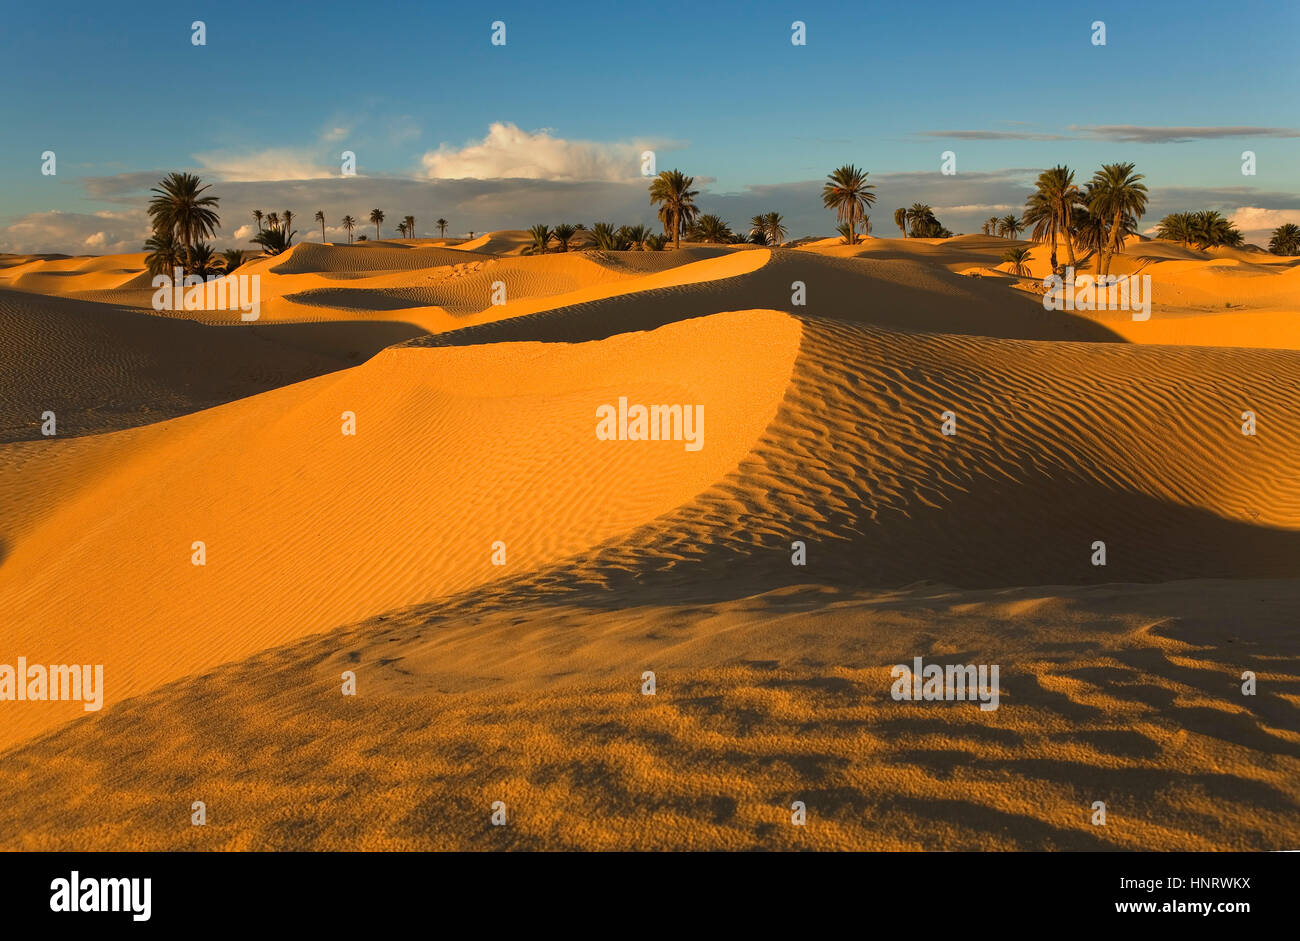 Tunisie.zaafrane douz (désert). Photo Stock